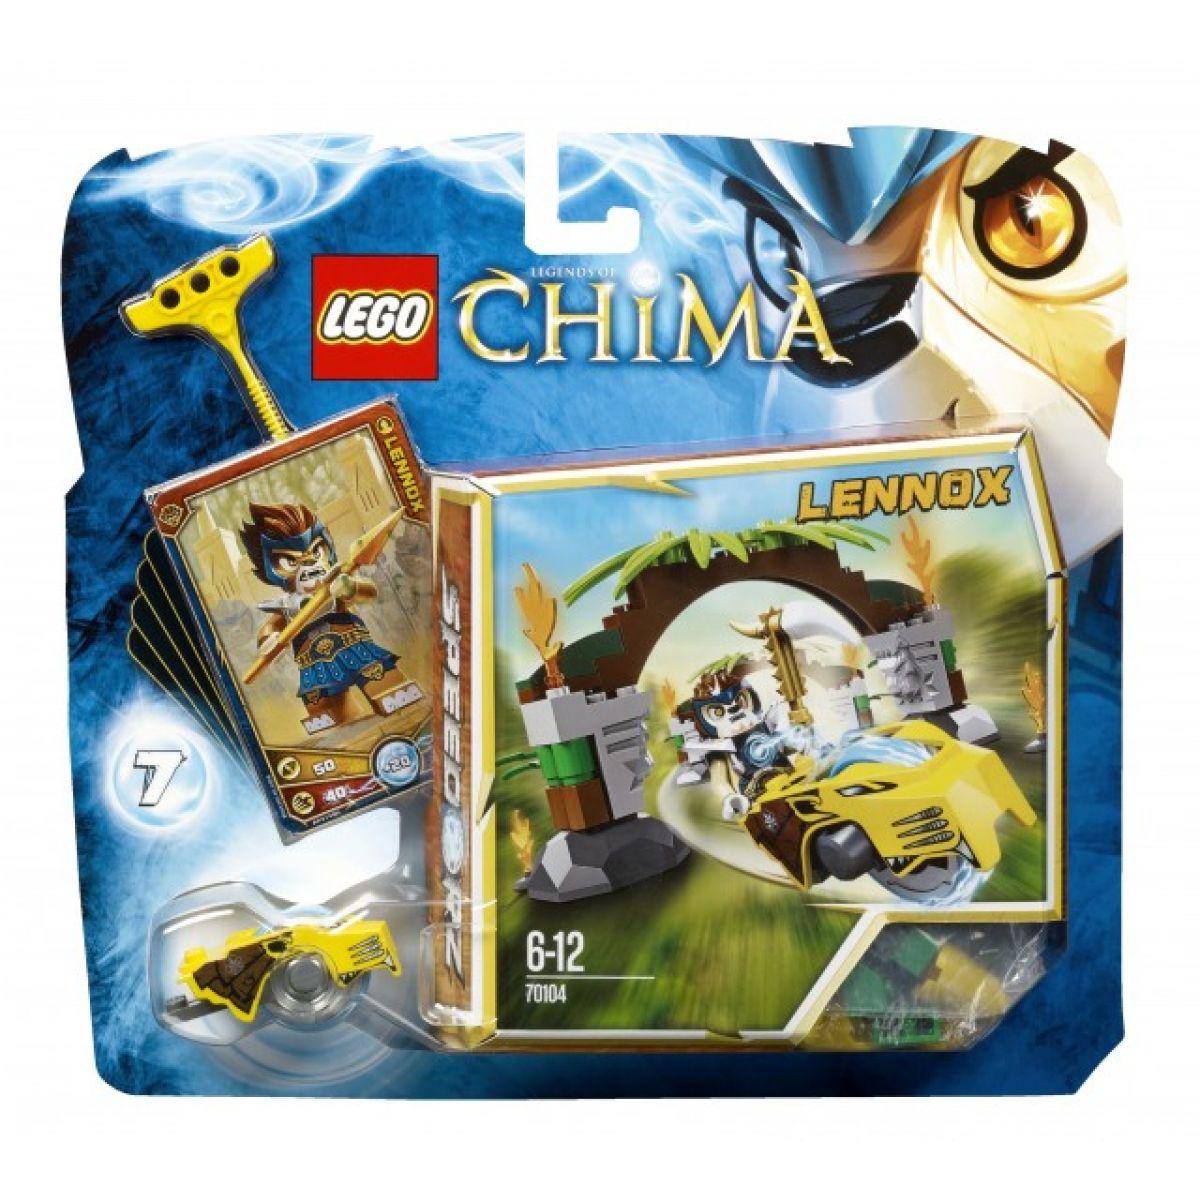 LEGO Chima 70104 Brány do džungle